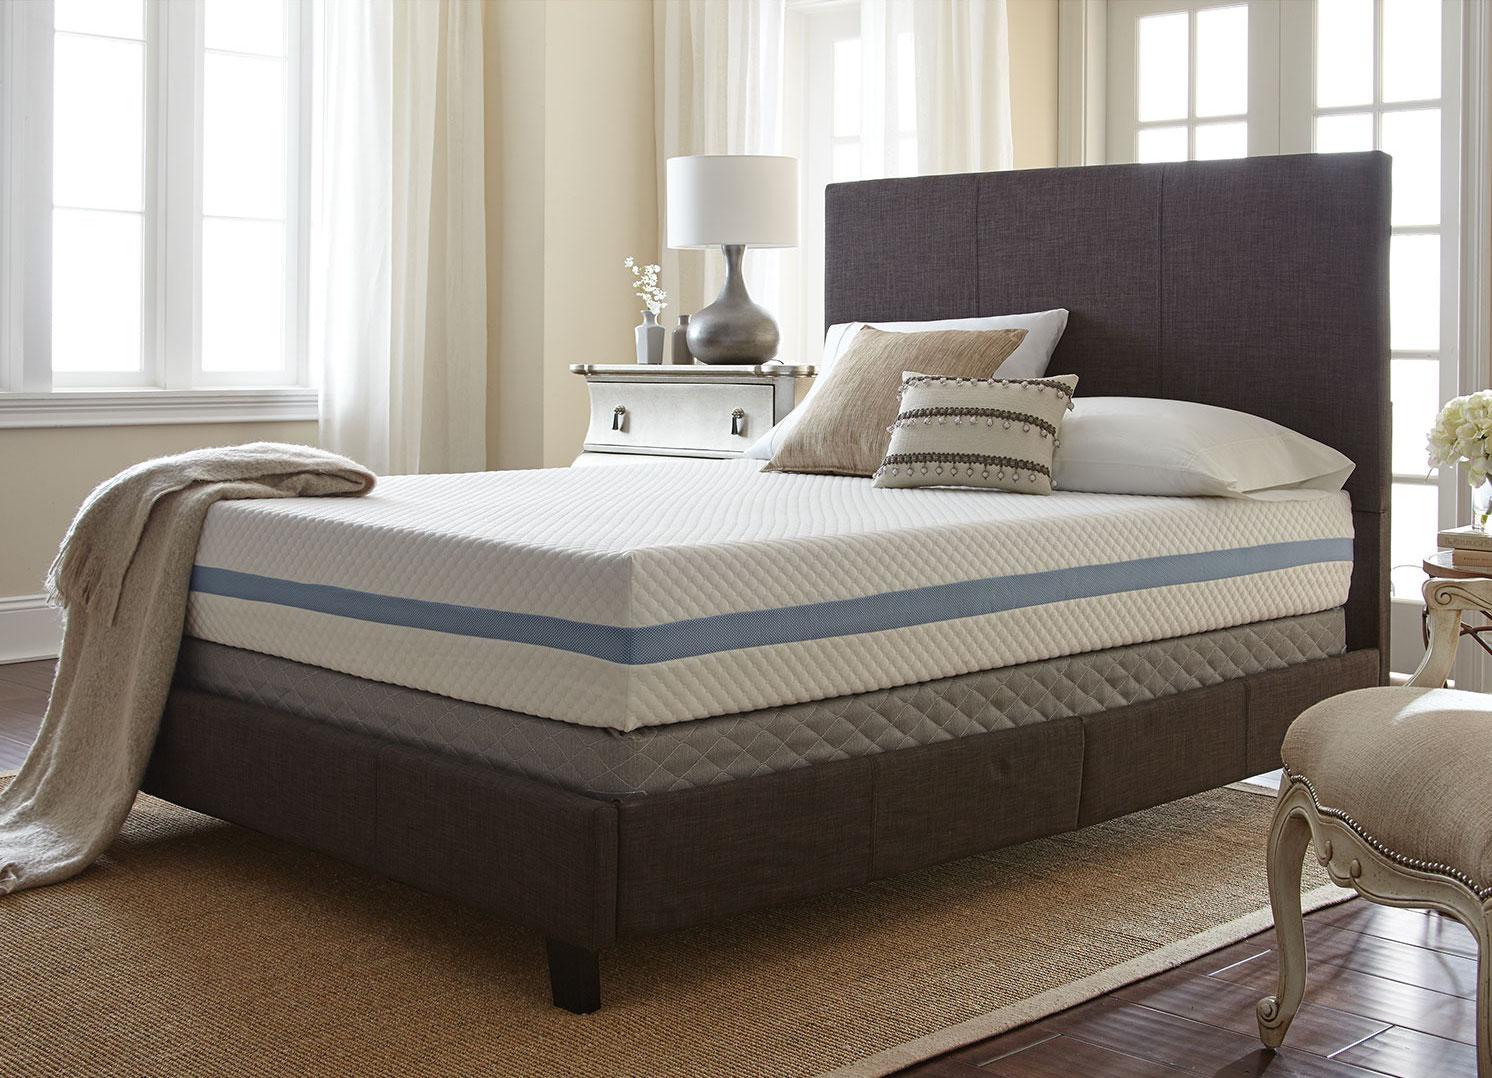 mattress buying guide - simple sleep gel memory foam mattress